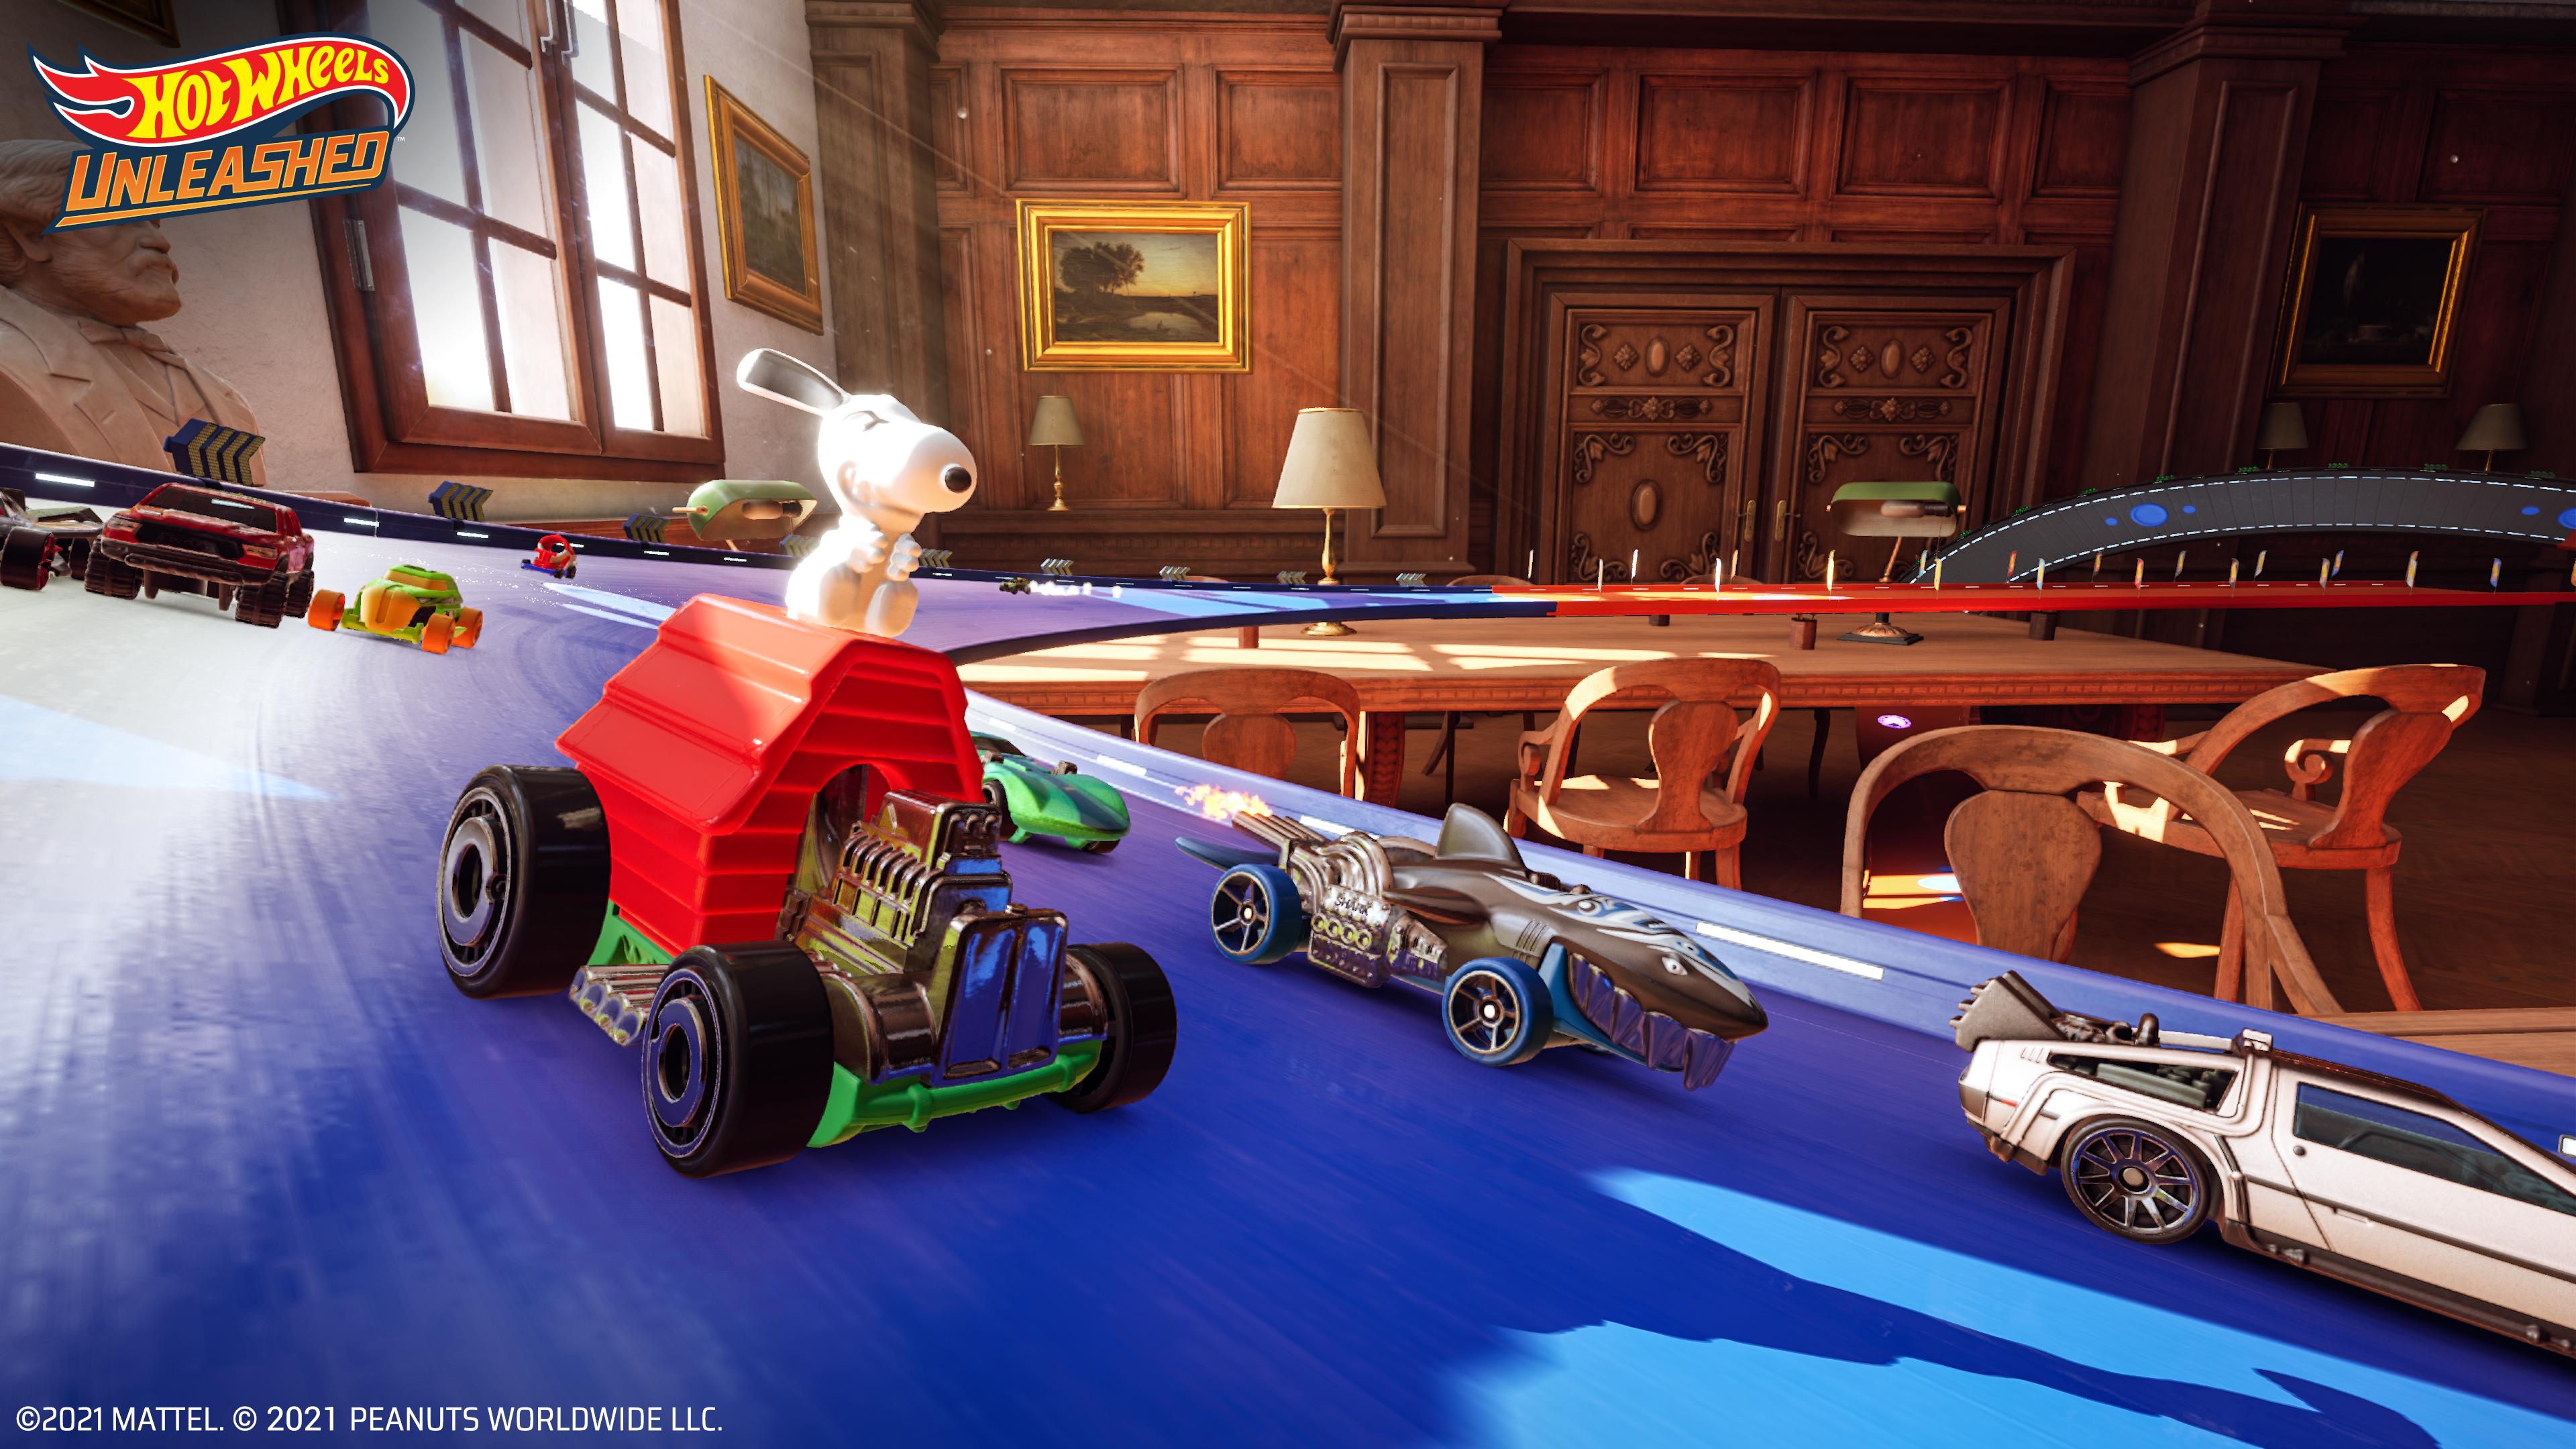 Hot-Wheels-Unleashed-5